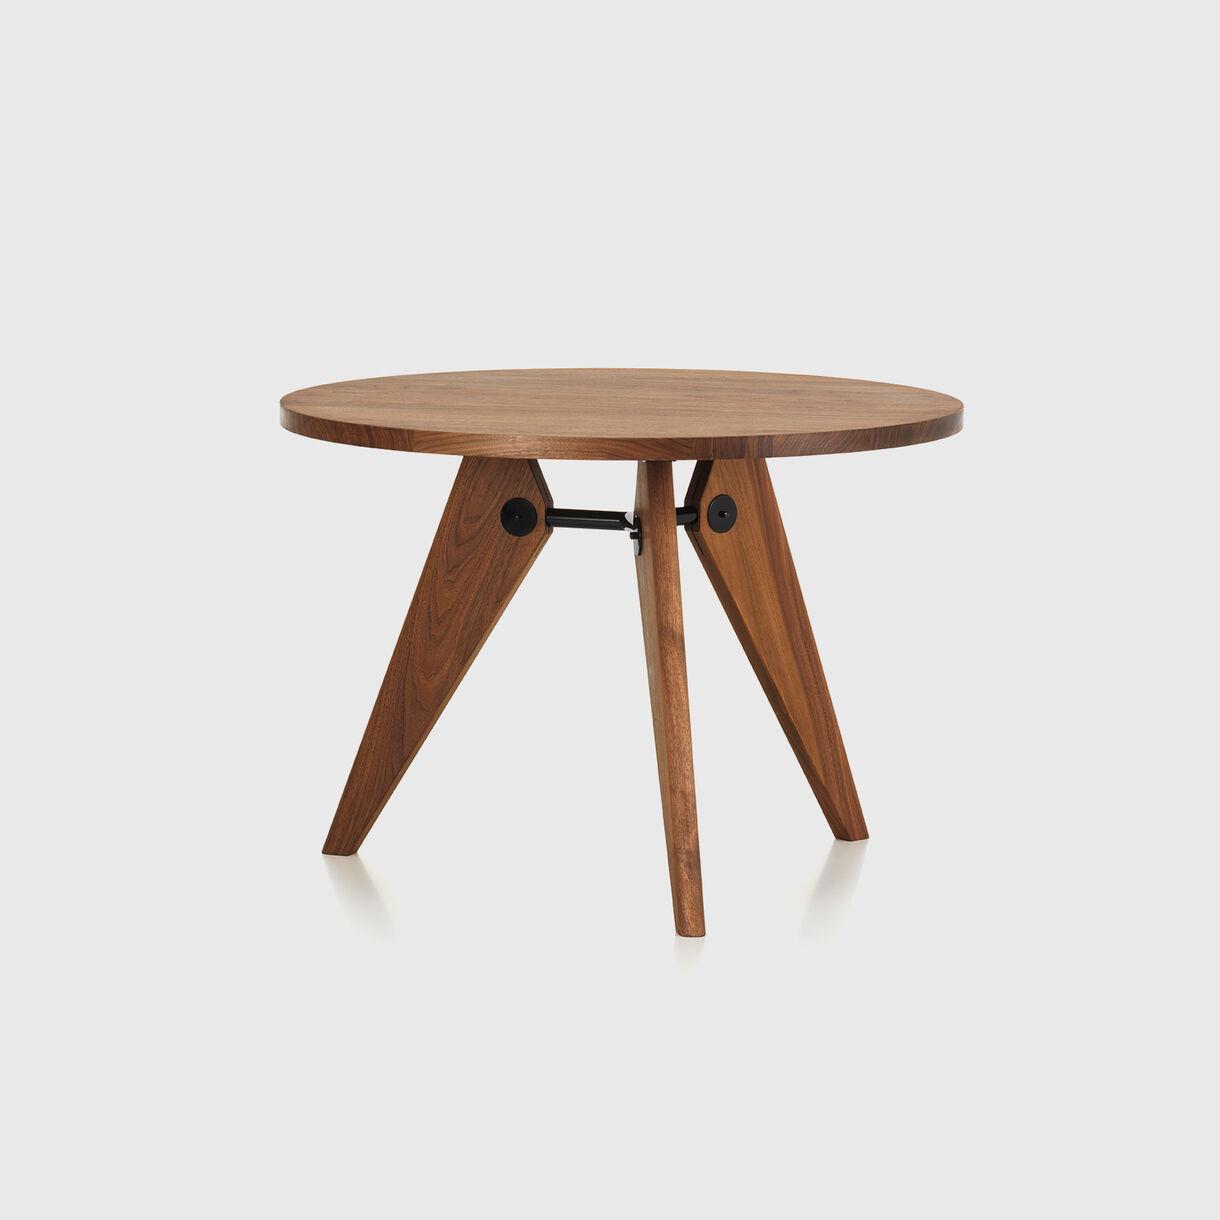 Guéridon Table, American Walnut